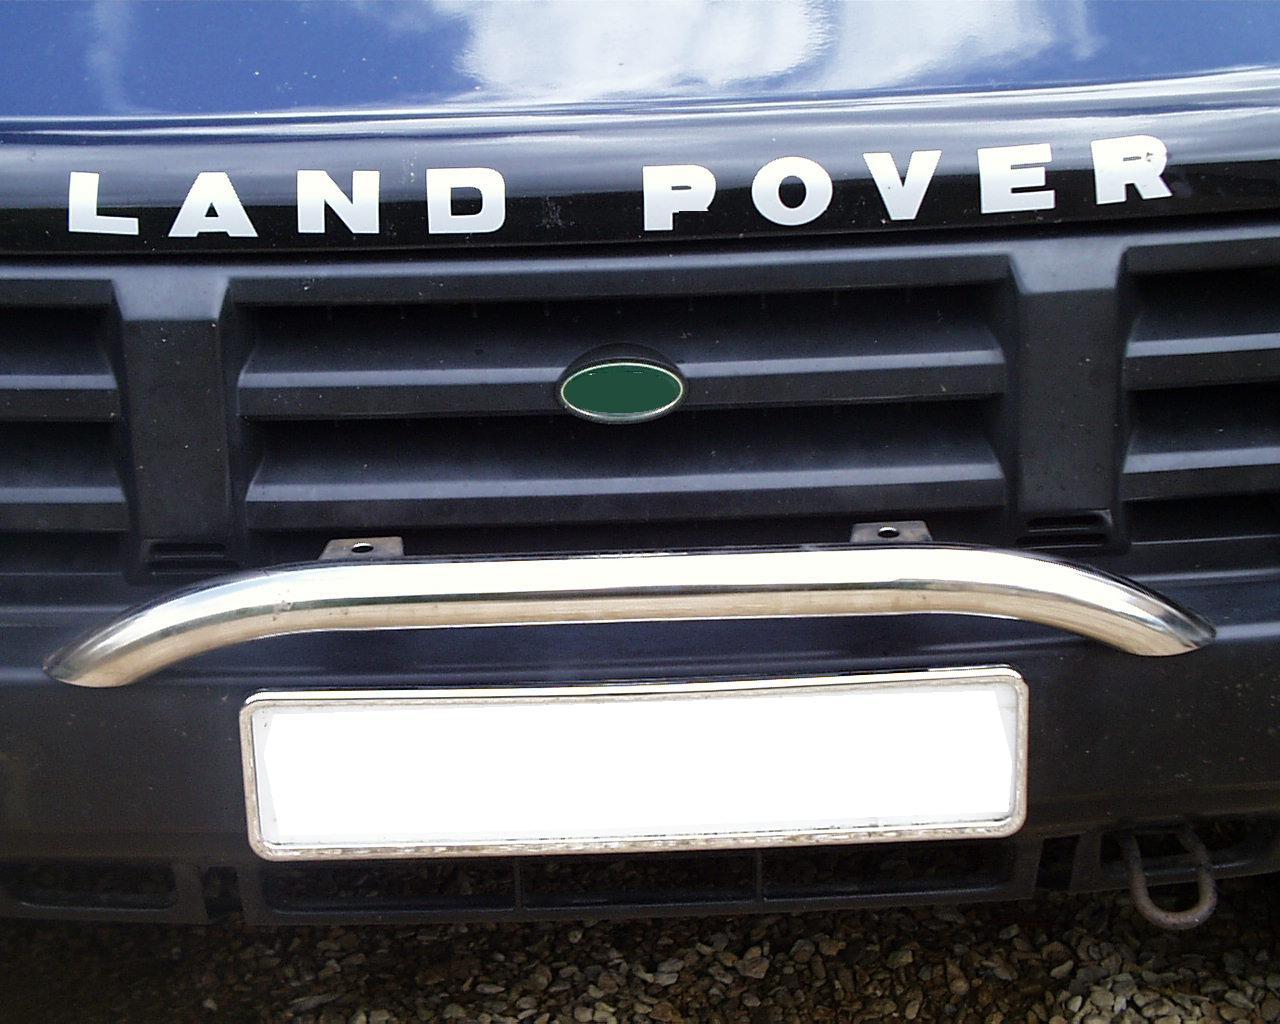 A chrome spot light bar for land rover discovery 1 2 200 300 td5 caractersticas del artculo aloadofball Choice Image